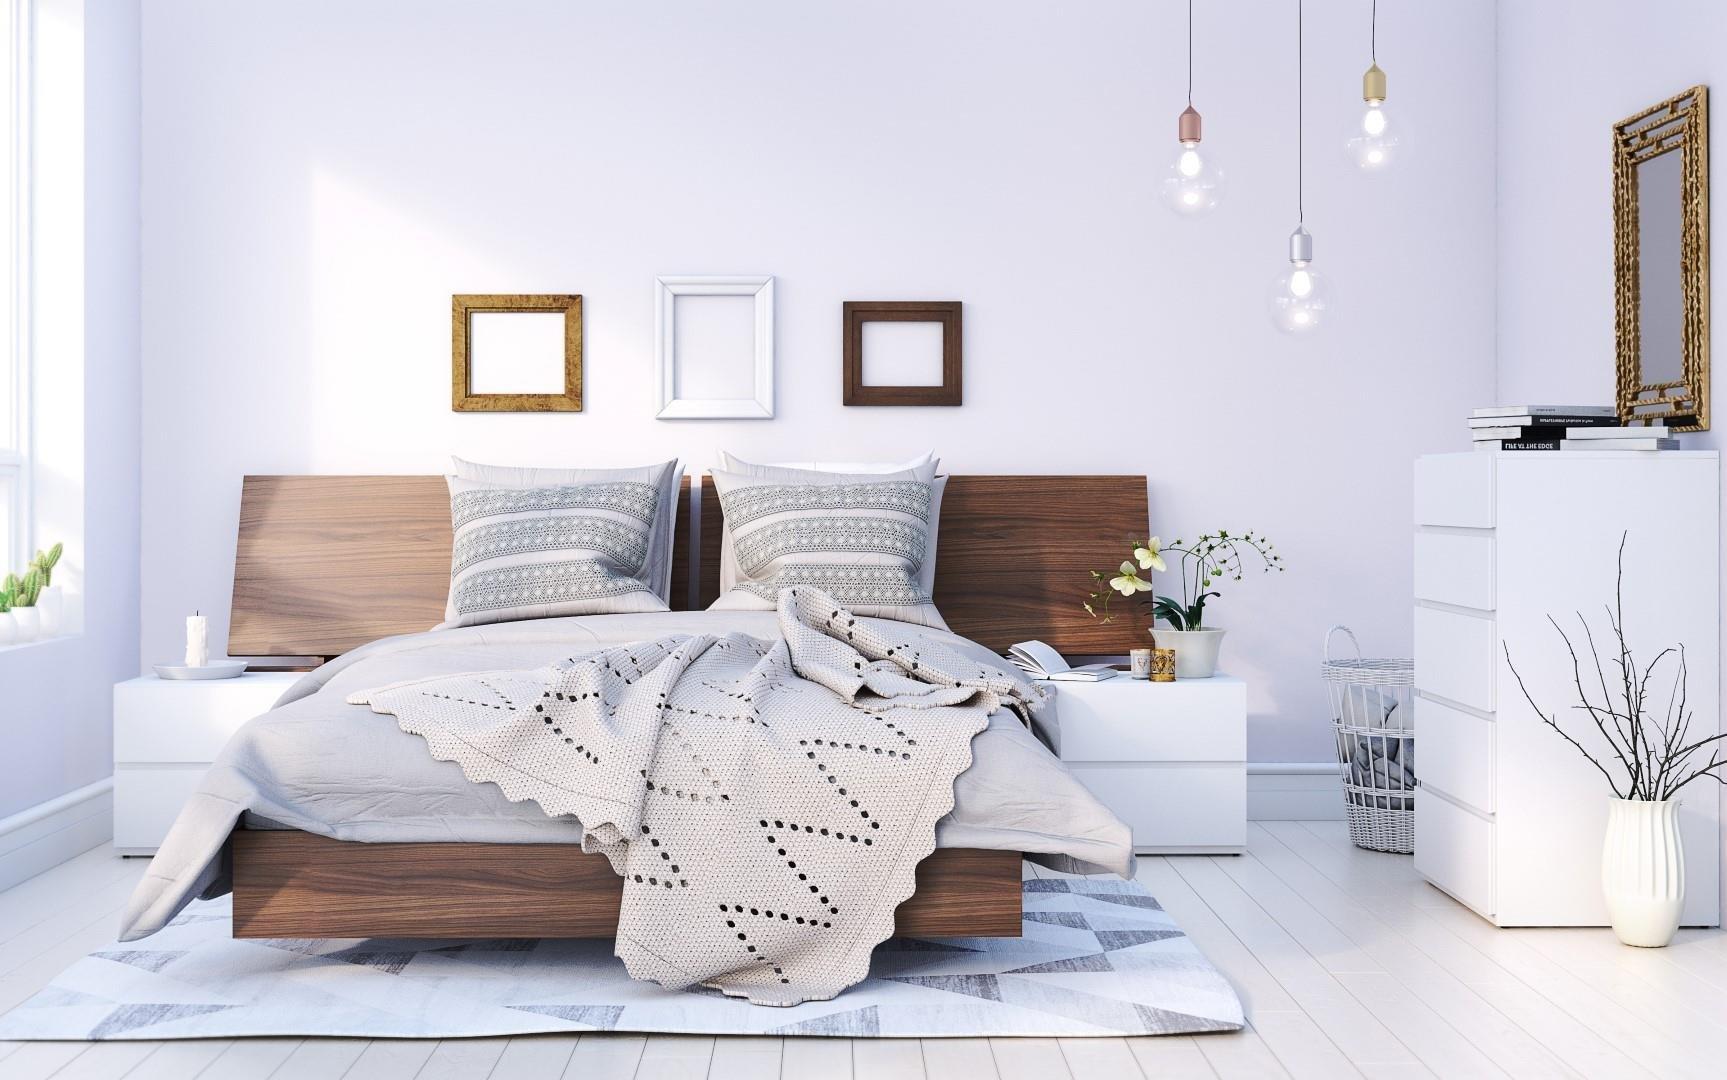 Nexera Denali 5 Piece Full Size Bedroom Set Walnut and White